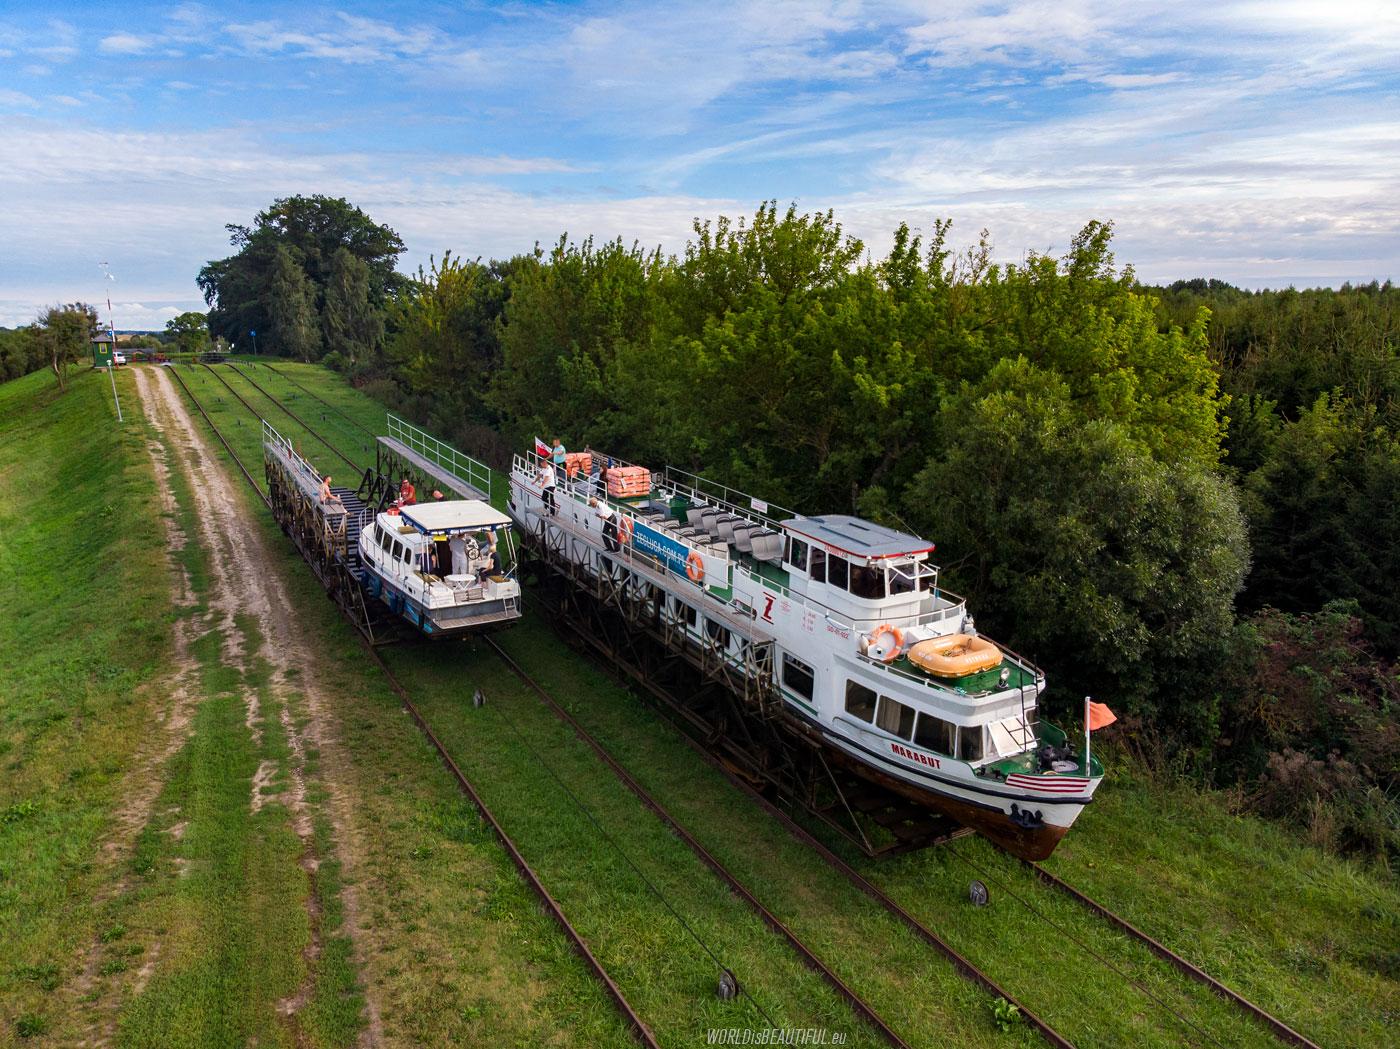 Ships on rails